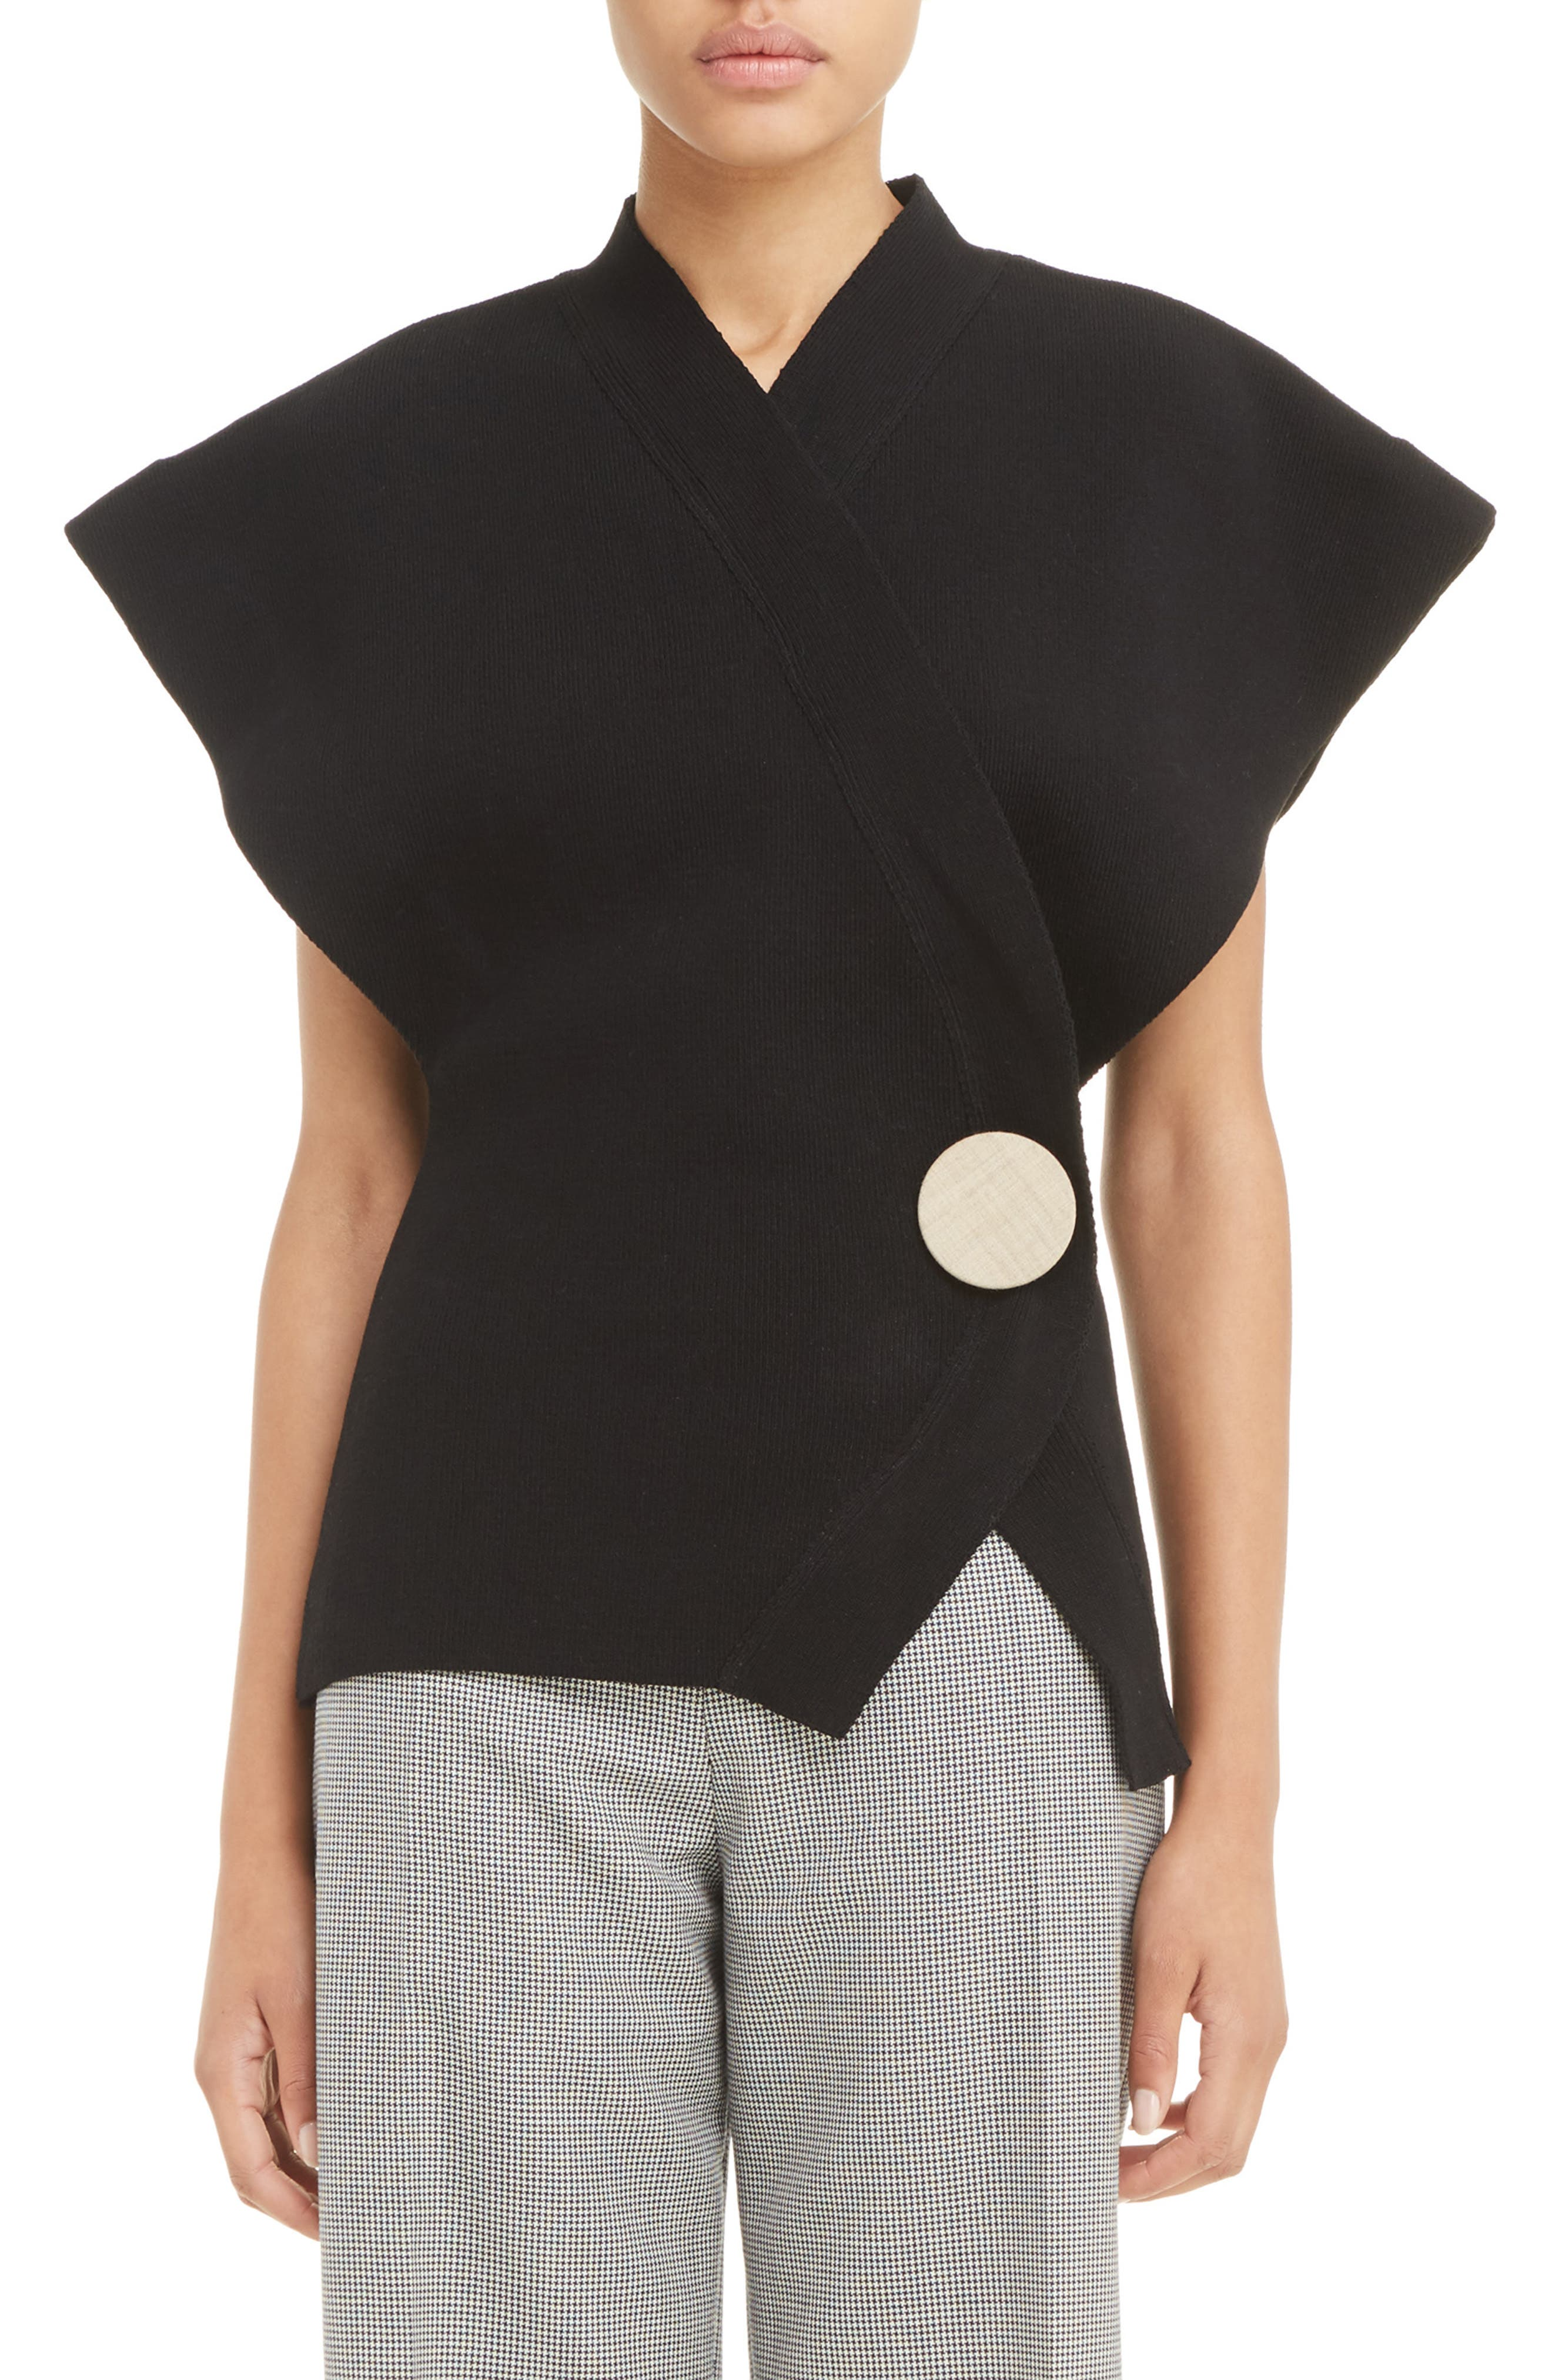 Alternate Image 1 Selected - Jacquemus Le Cardigan Wrap Sweater